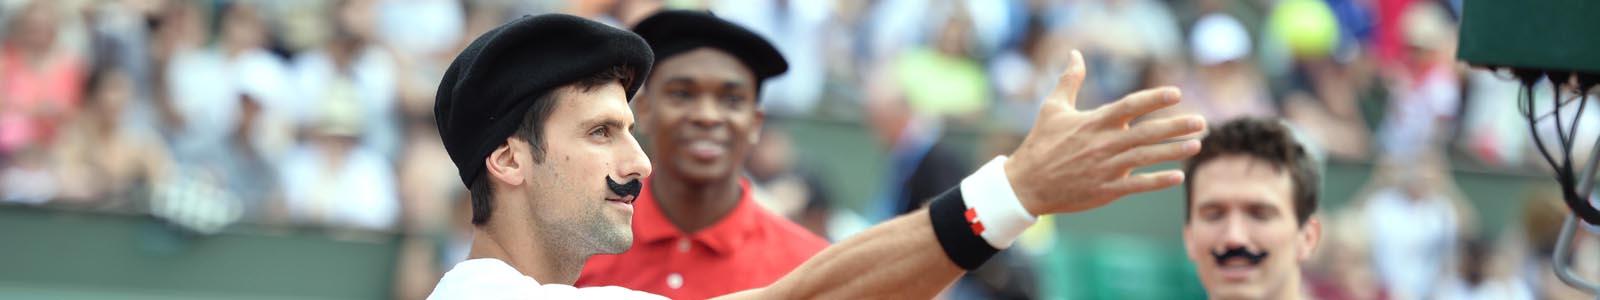 rolland garros Djokovic 2016